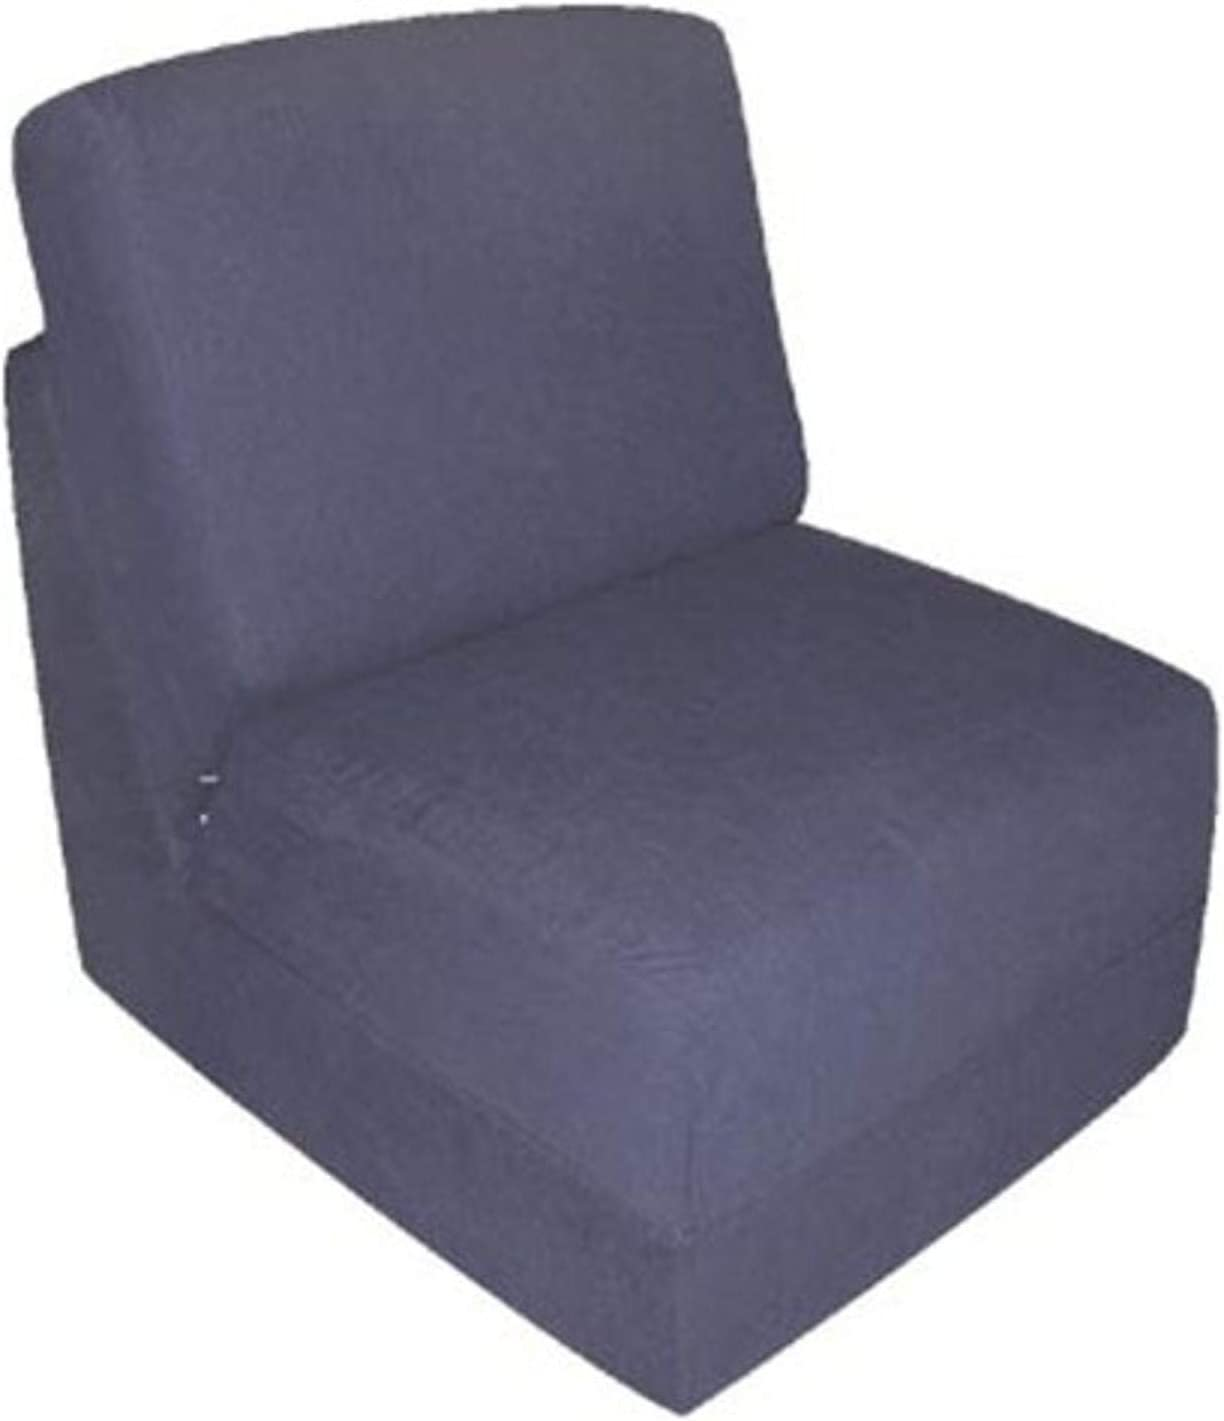 Fun Furnishings Teen Chair, Navy